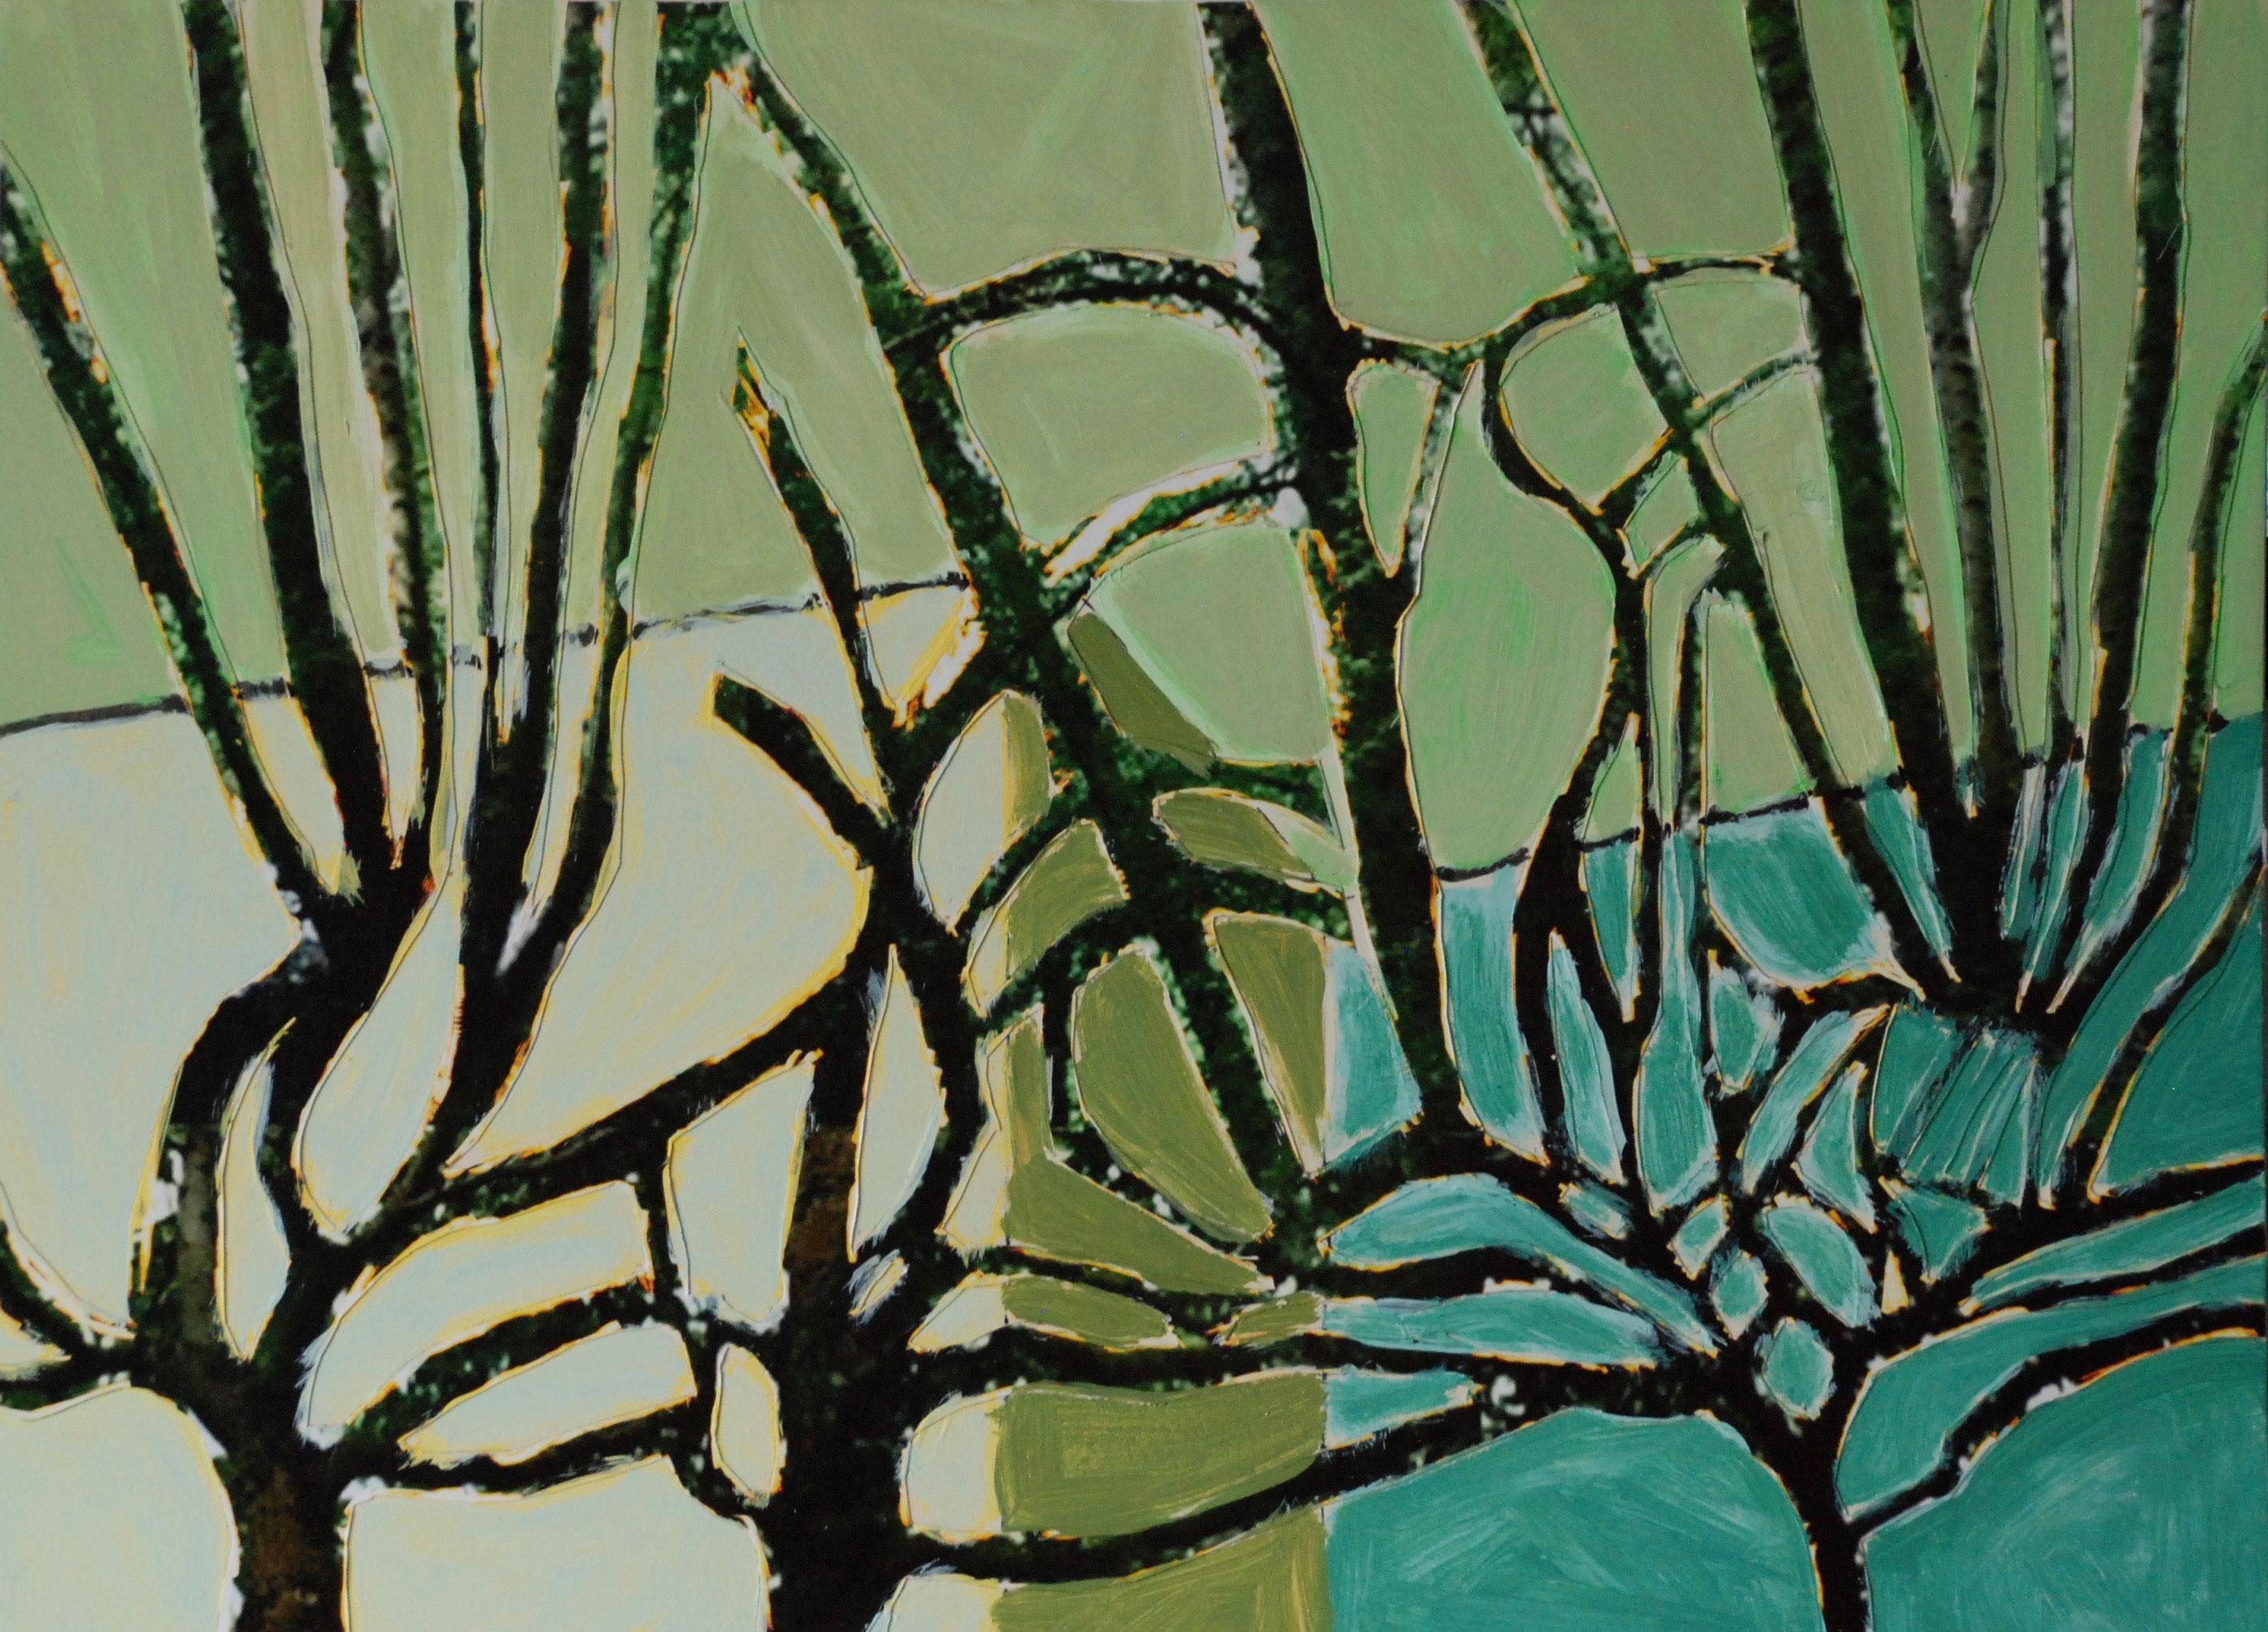 winterboom 34,2 x 25,3 x 1,3 cm